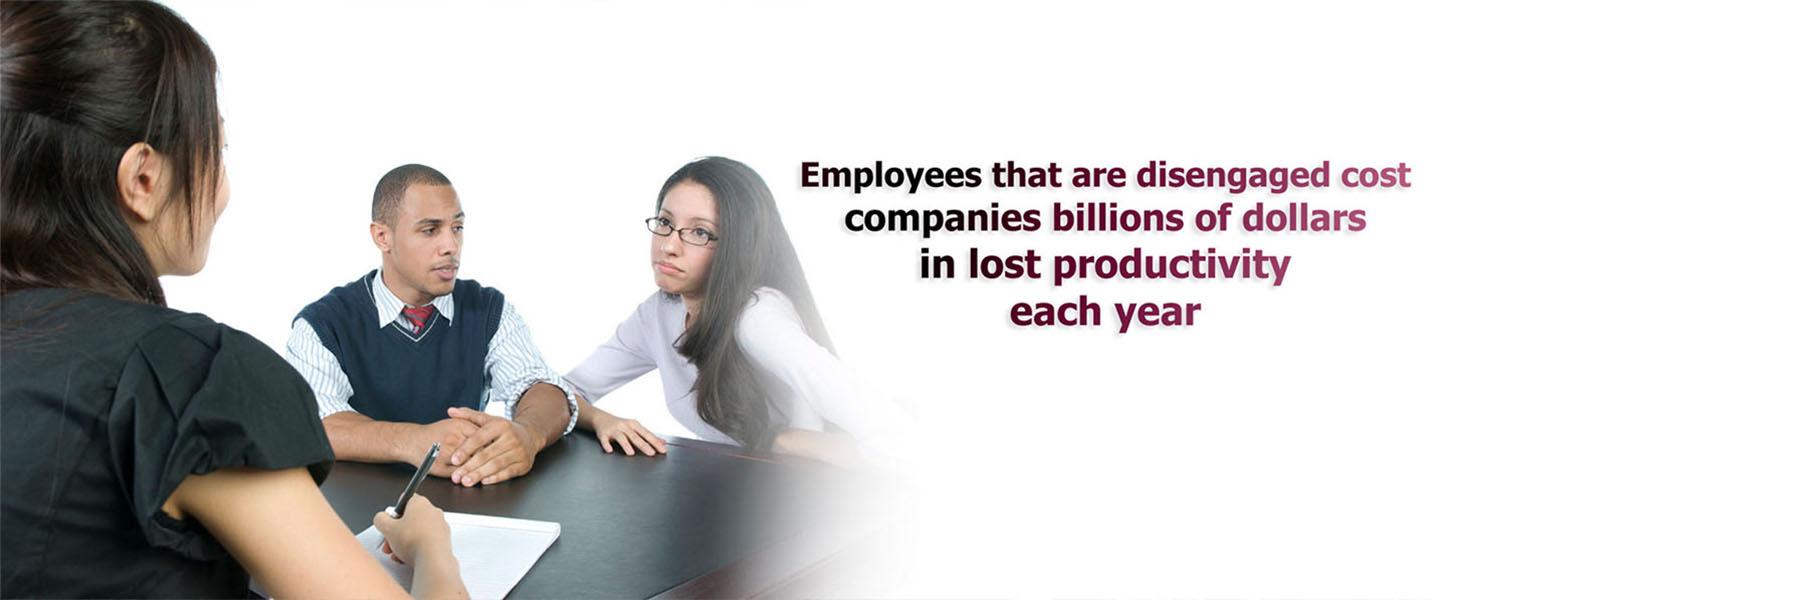 Executive Diversity Services Diversity Inclusion Cultural Competence